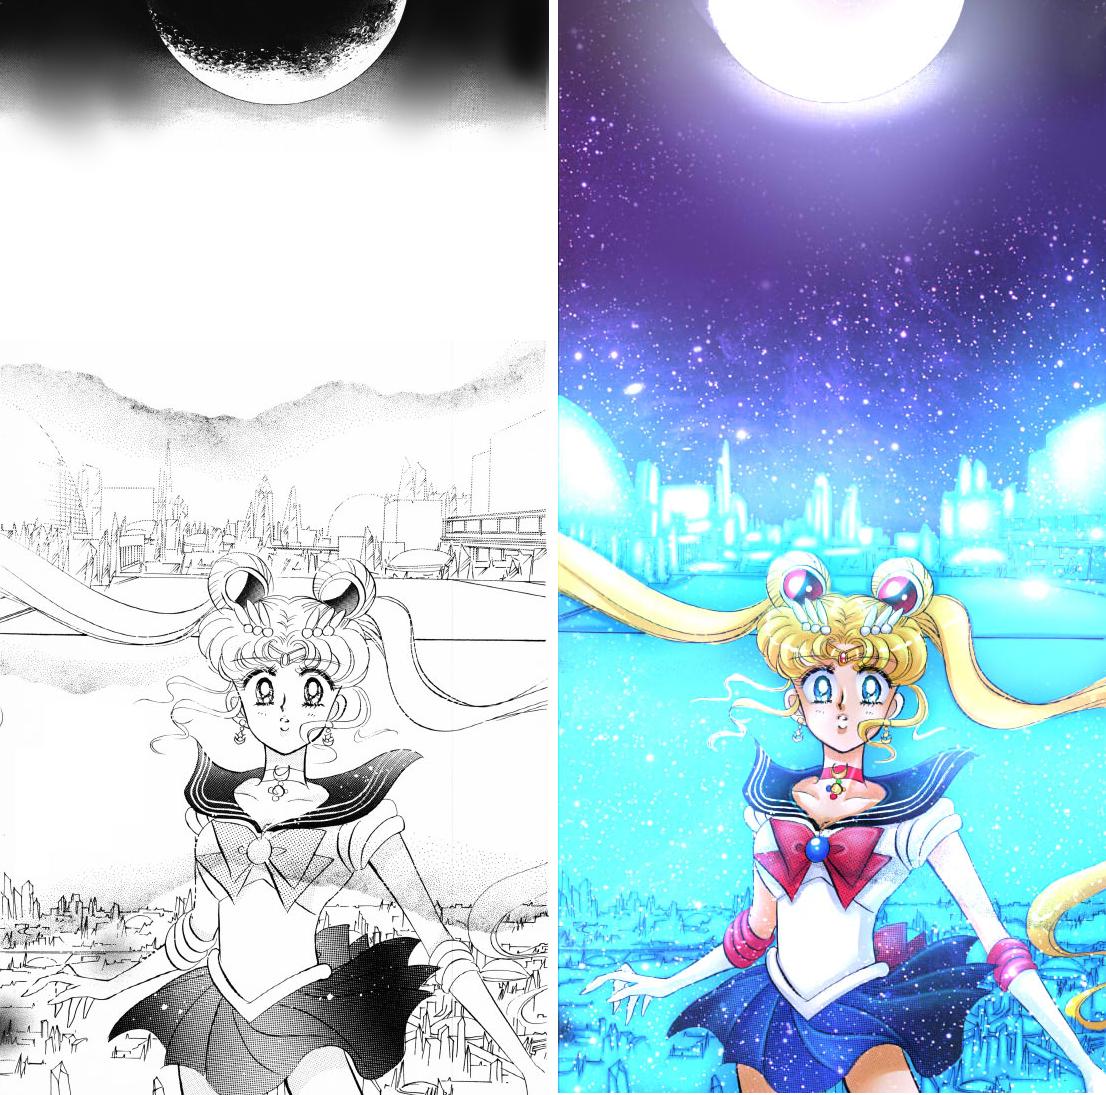 http://crystalsenshiofmercury.tumblr.com/post/50248388853/sailor-moon-manga-color-over-art-c-naoko